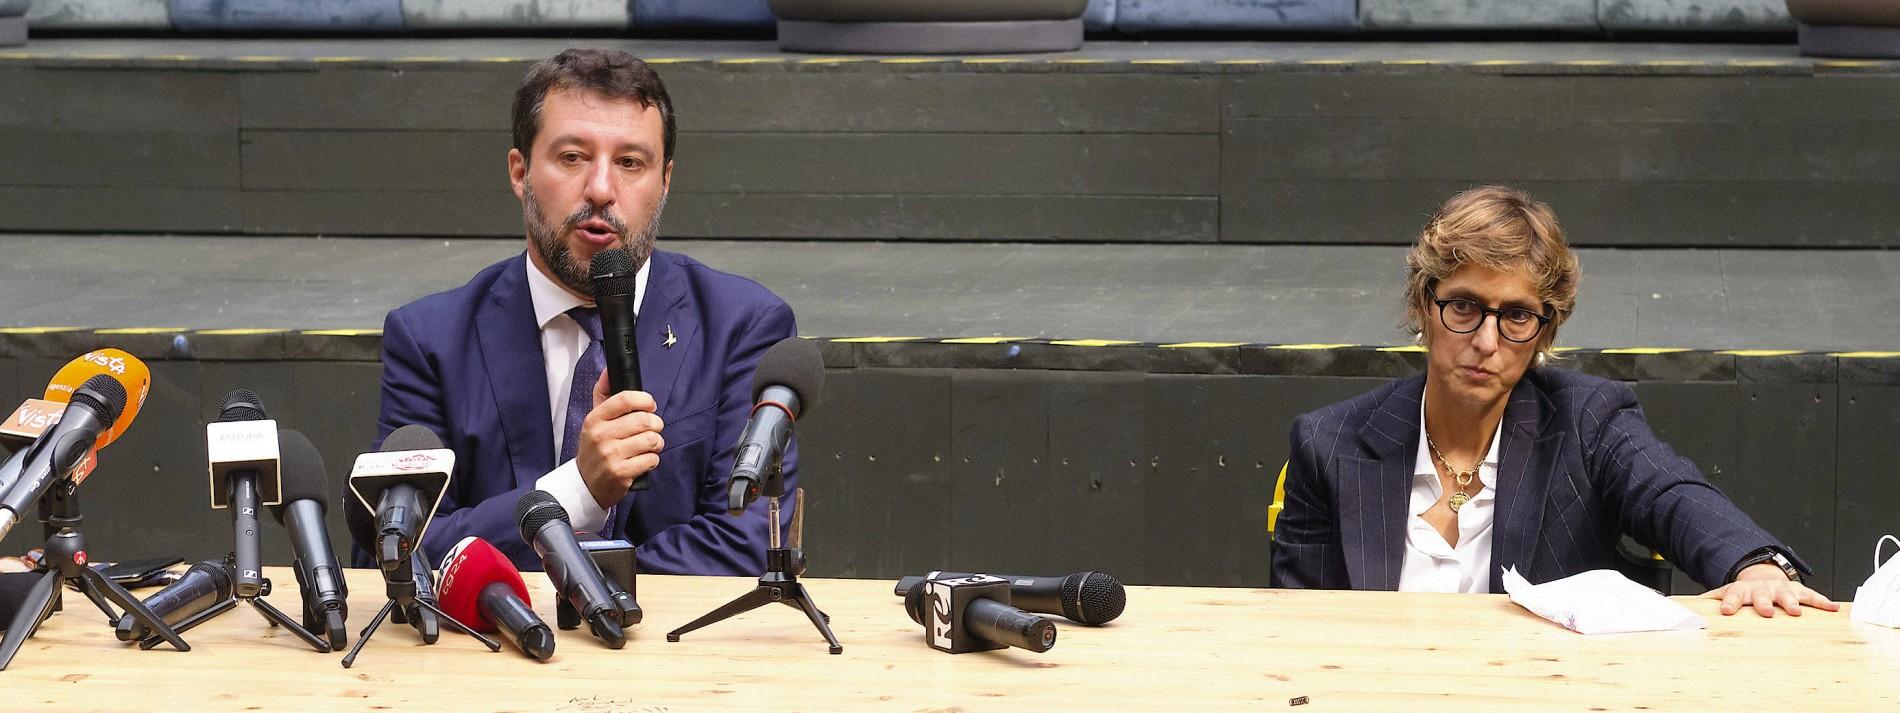 Erster Erfolg für Salvini?